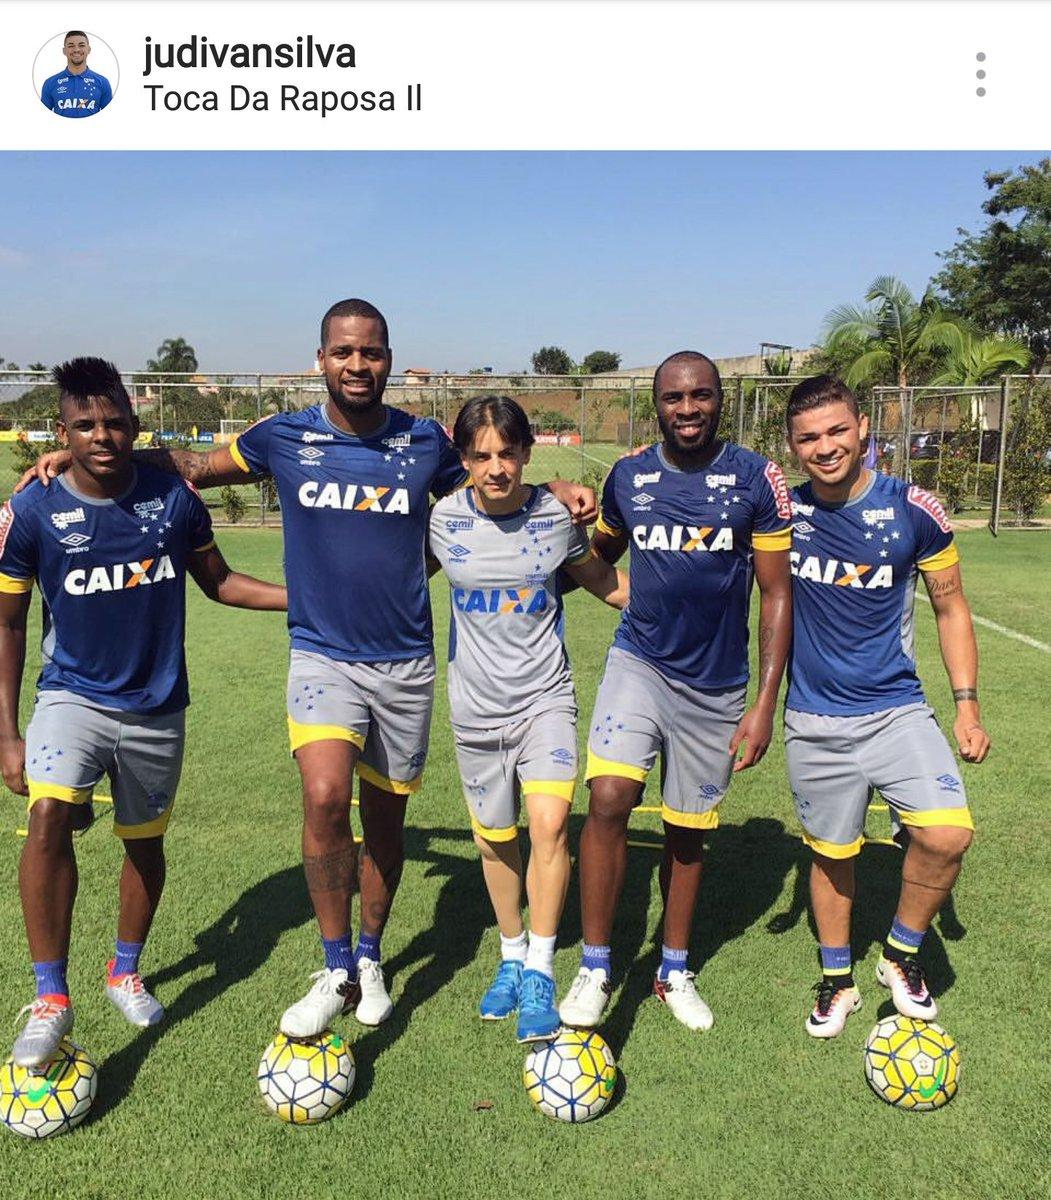 Samuel Venancio Auf Twitter Judivan Dede Manoel E Marcos Vinicius No Campo Mas Todos Ainda Trabalhos De Fisioterapia Itatiaia